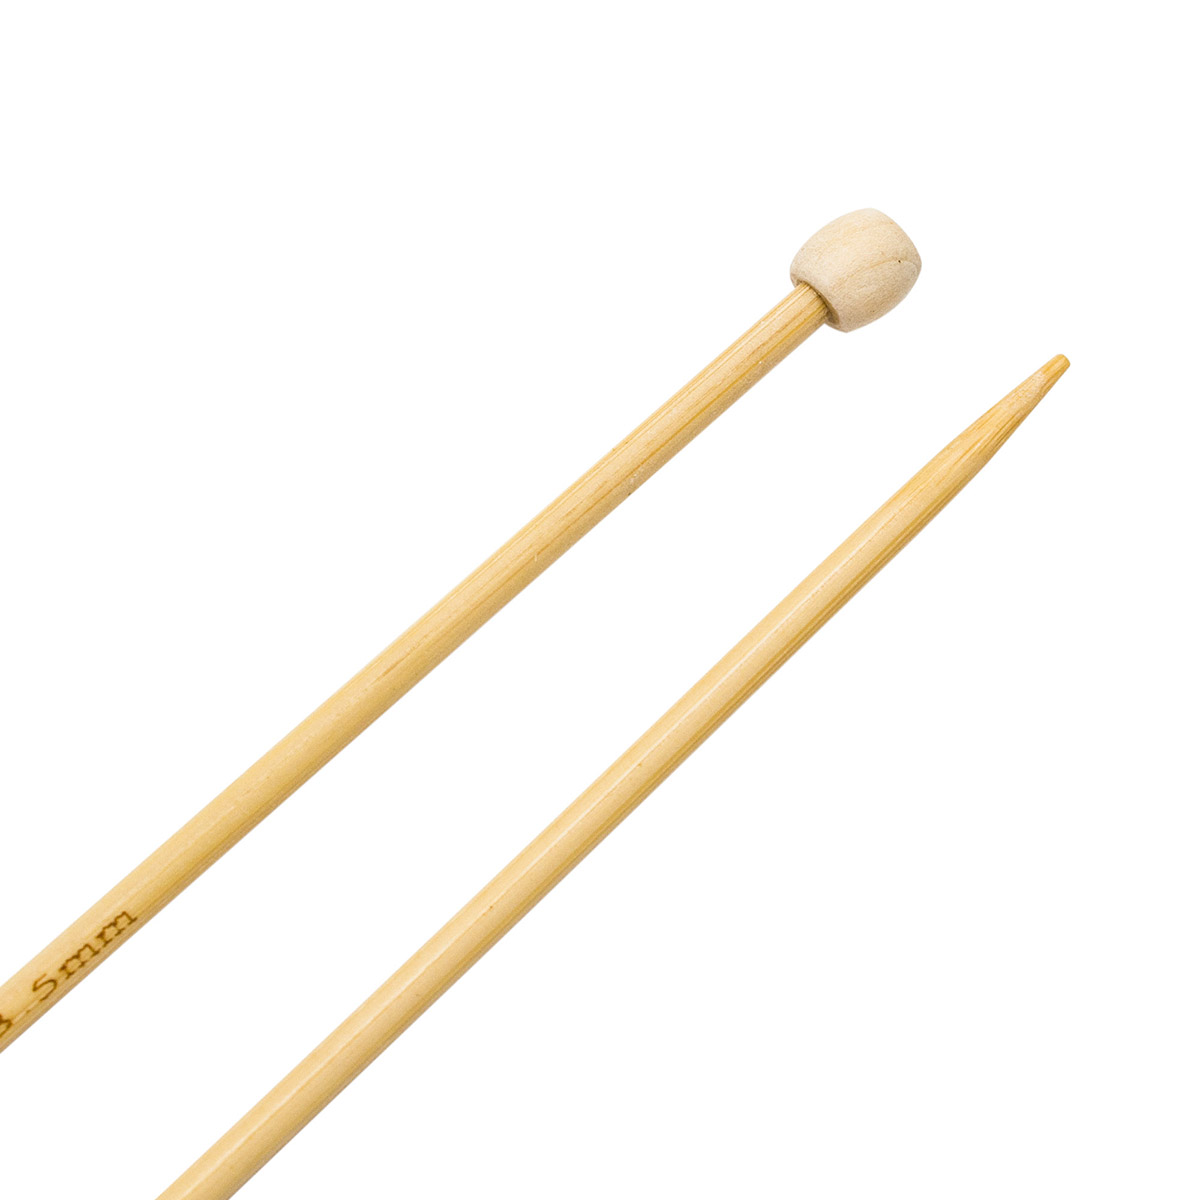 Спицы прямые бамбук 942235, 35 см, 3,5 мм, Hobby&Pro